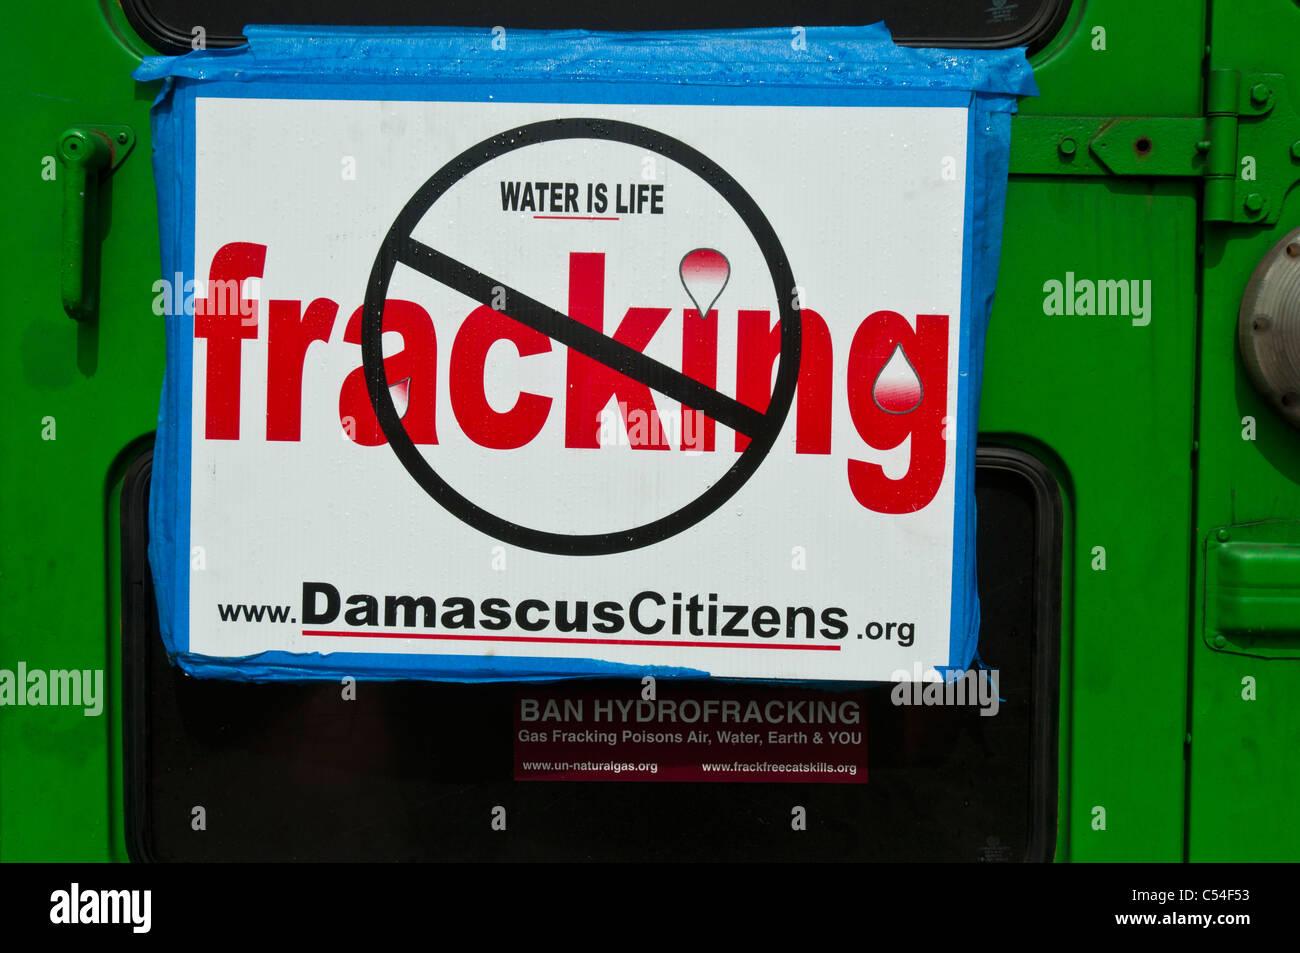 Wasser ist Leben, anti-Fracking-Platte auf grünen Auto, New York, USA Stockbild